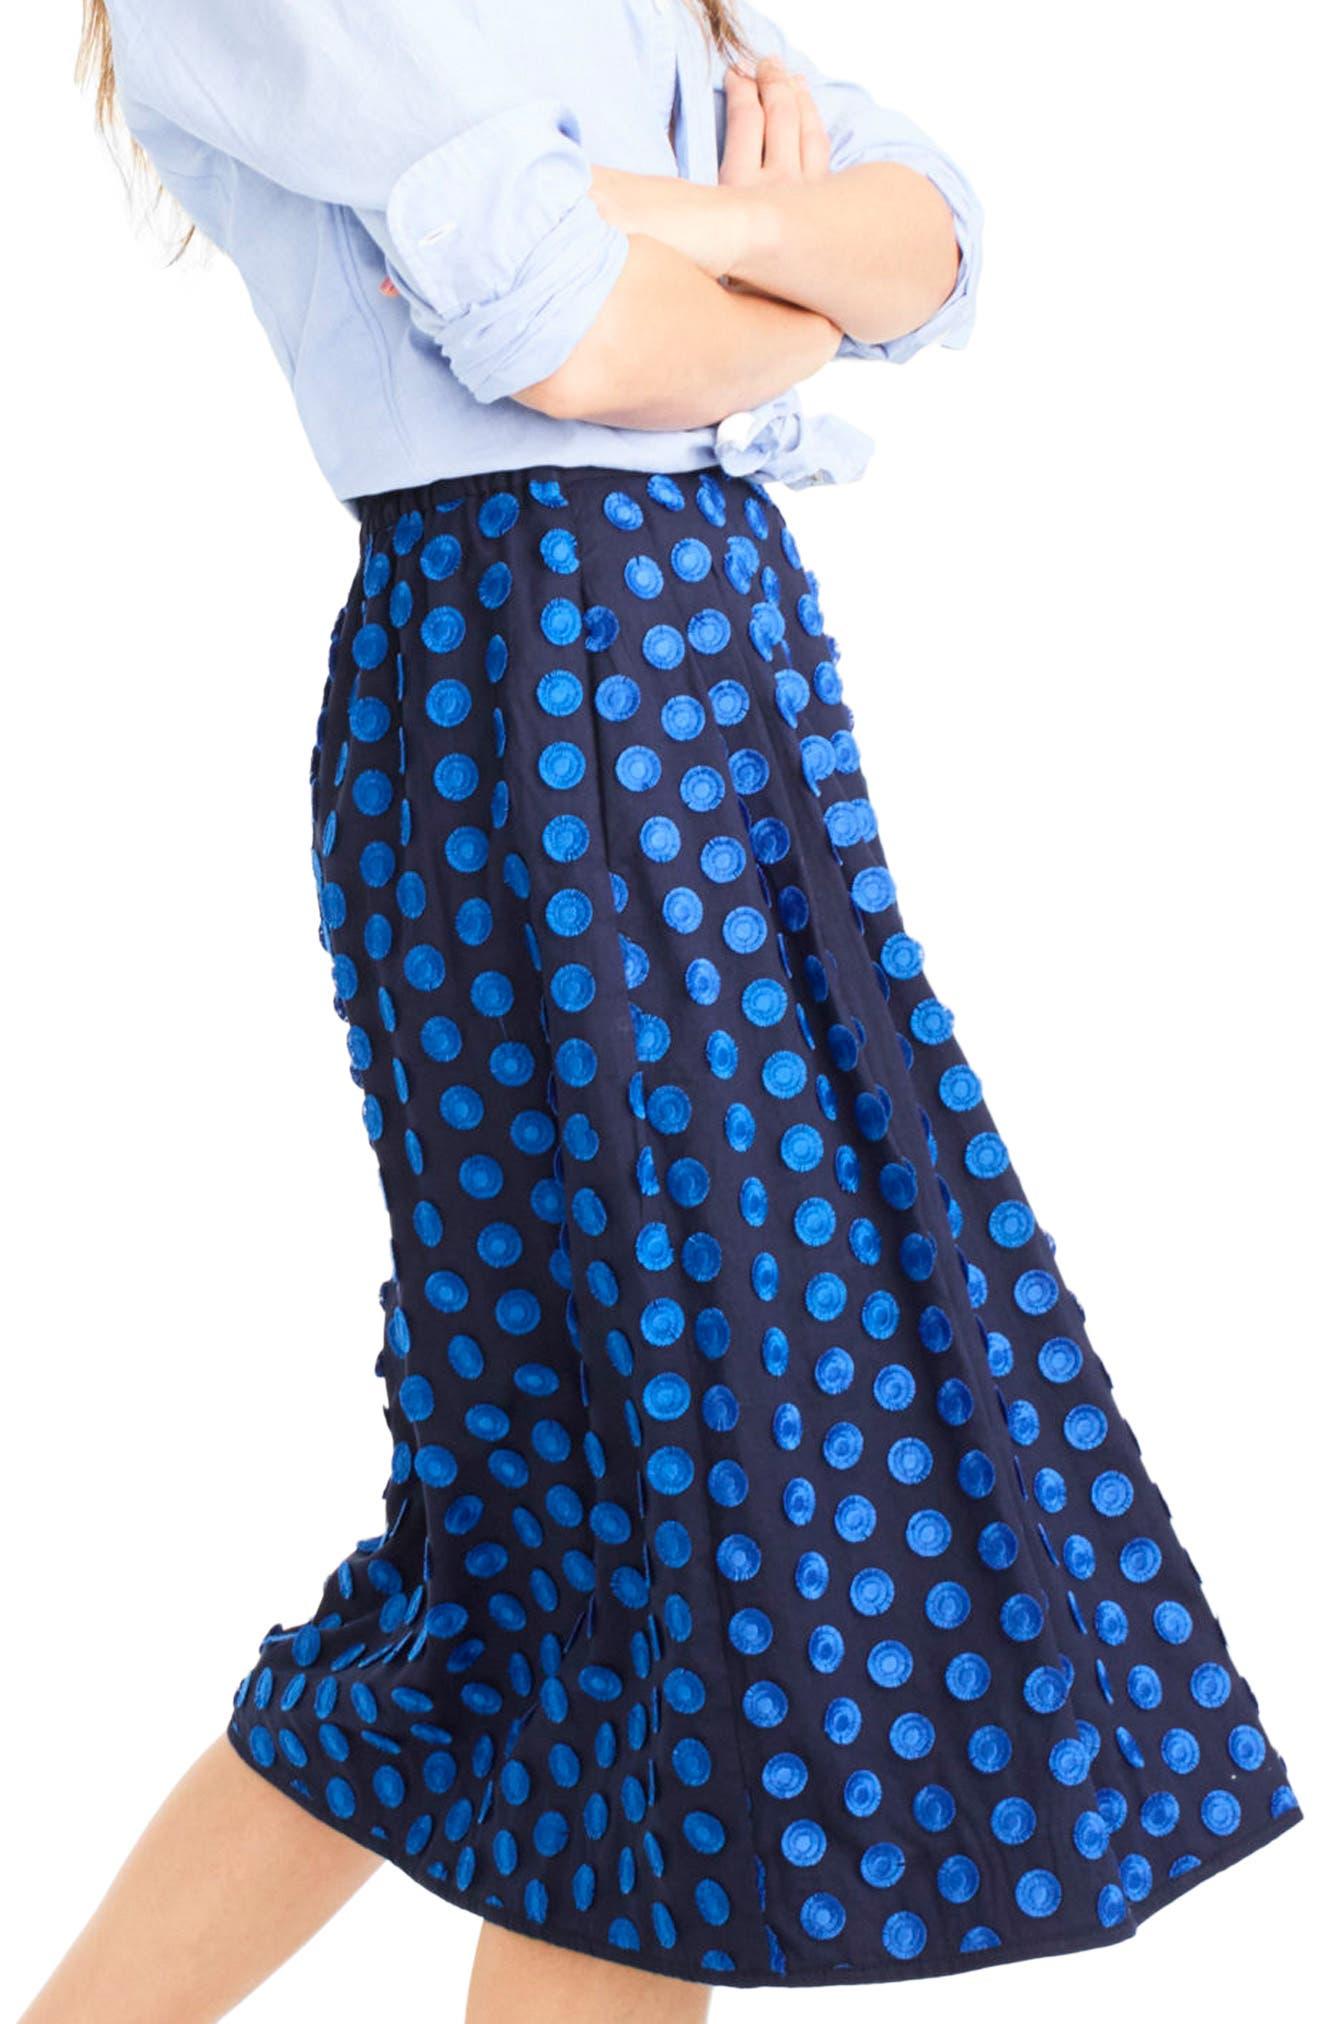 Main Image - J.Crew Fringe Dot Midi Skirt (Regular & Petite)